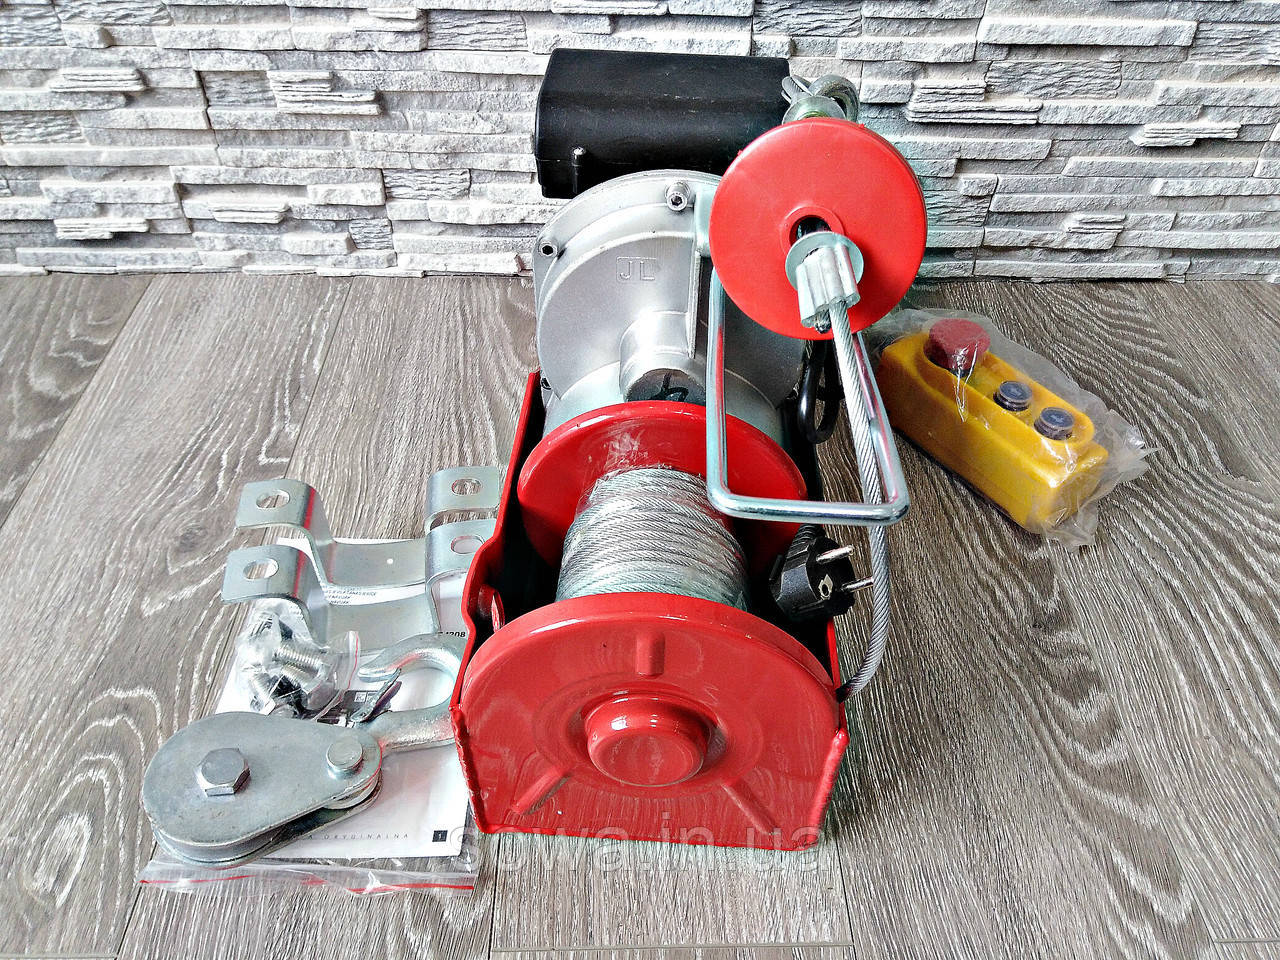 ✔️ Електрична лебідка, тельфер Euro Craft HJ208 _ 500/1000kg .